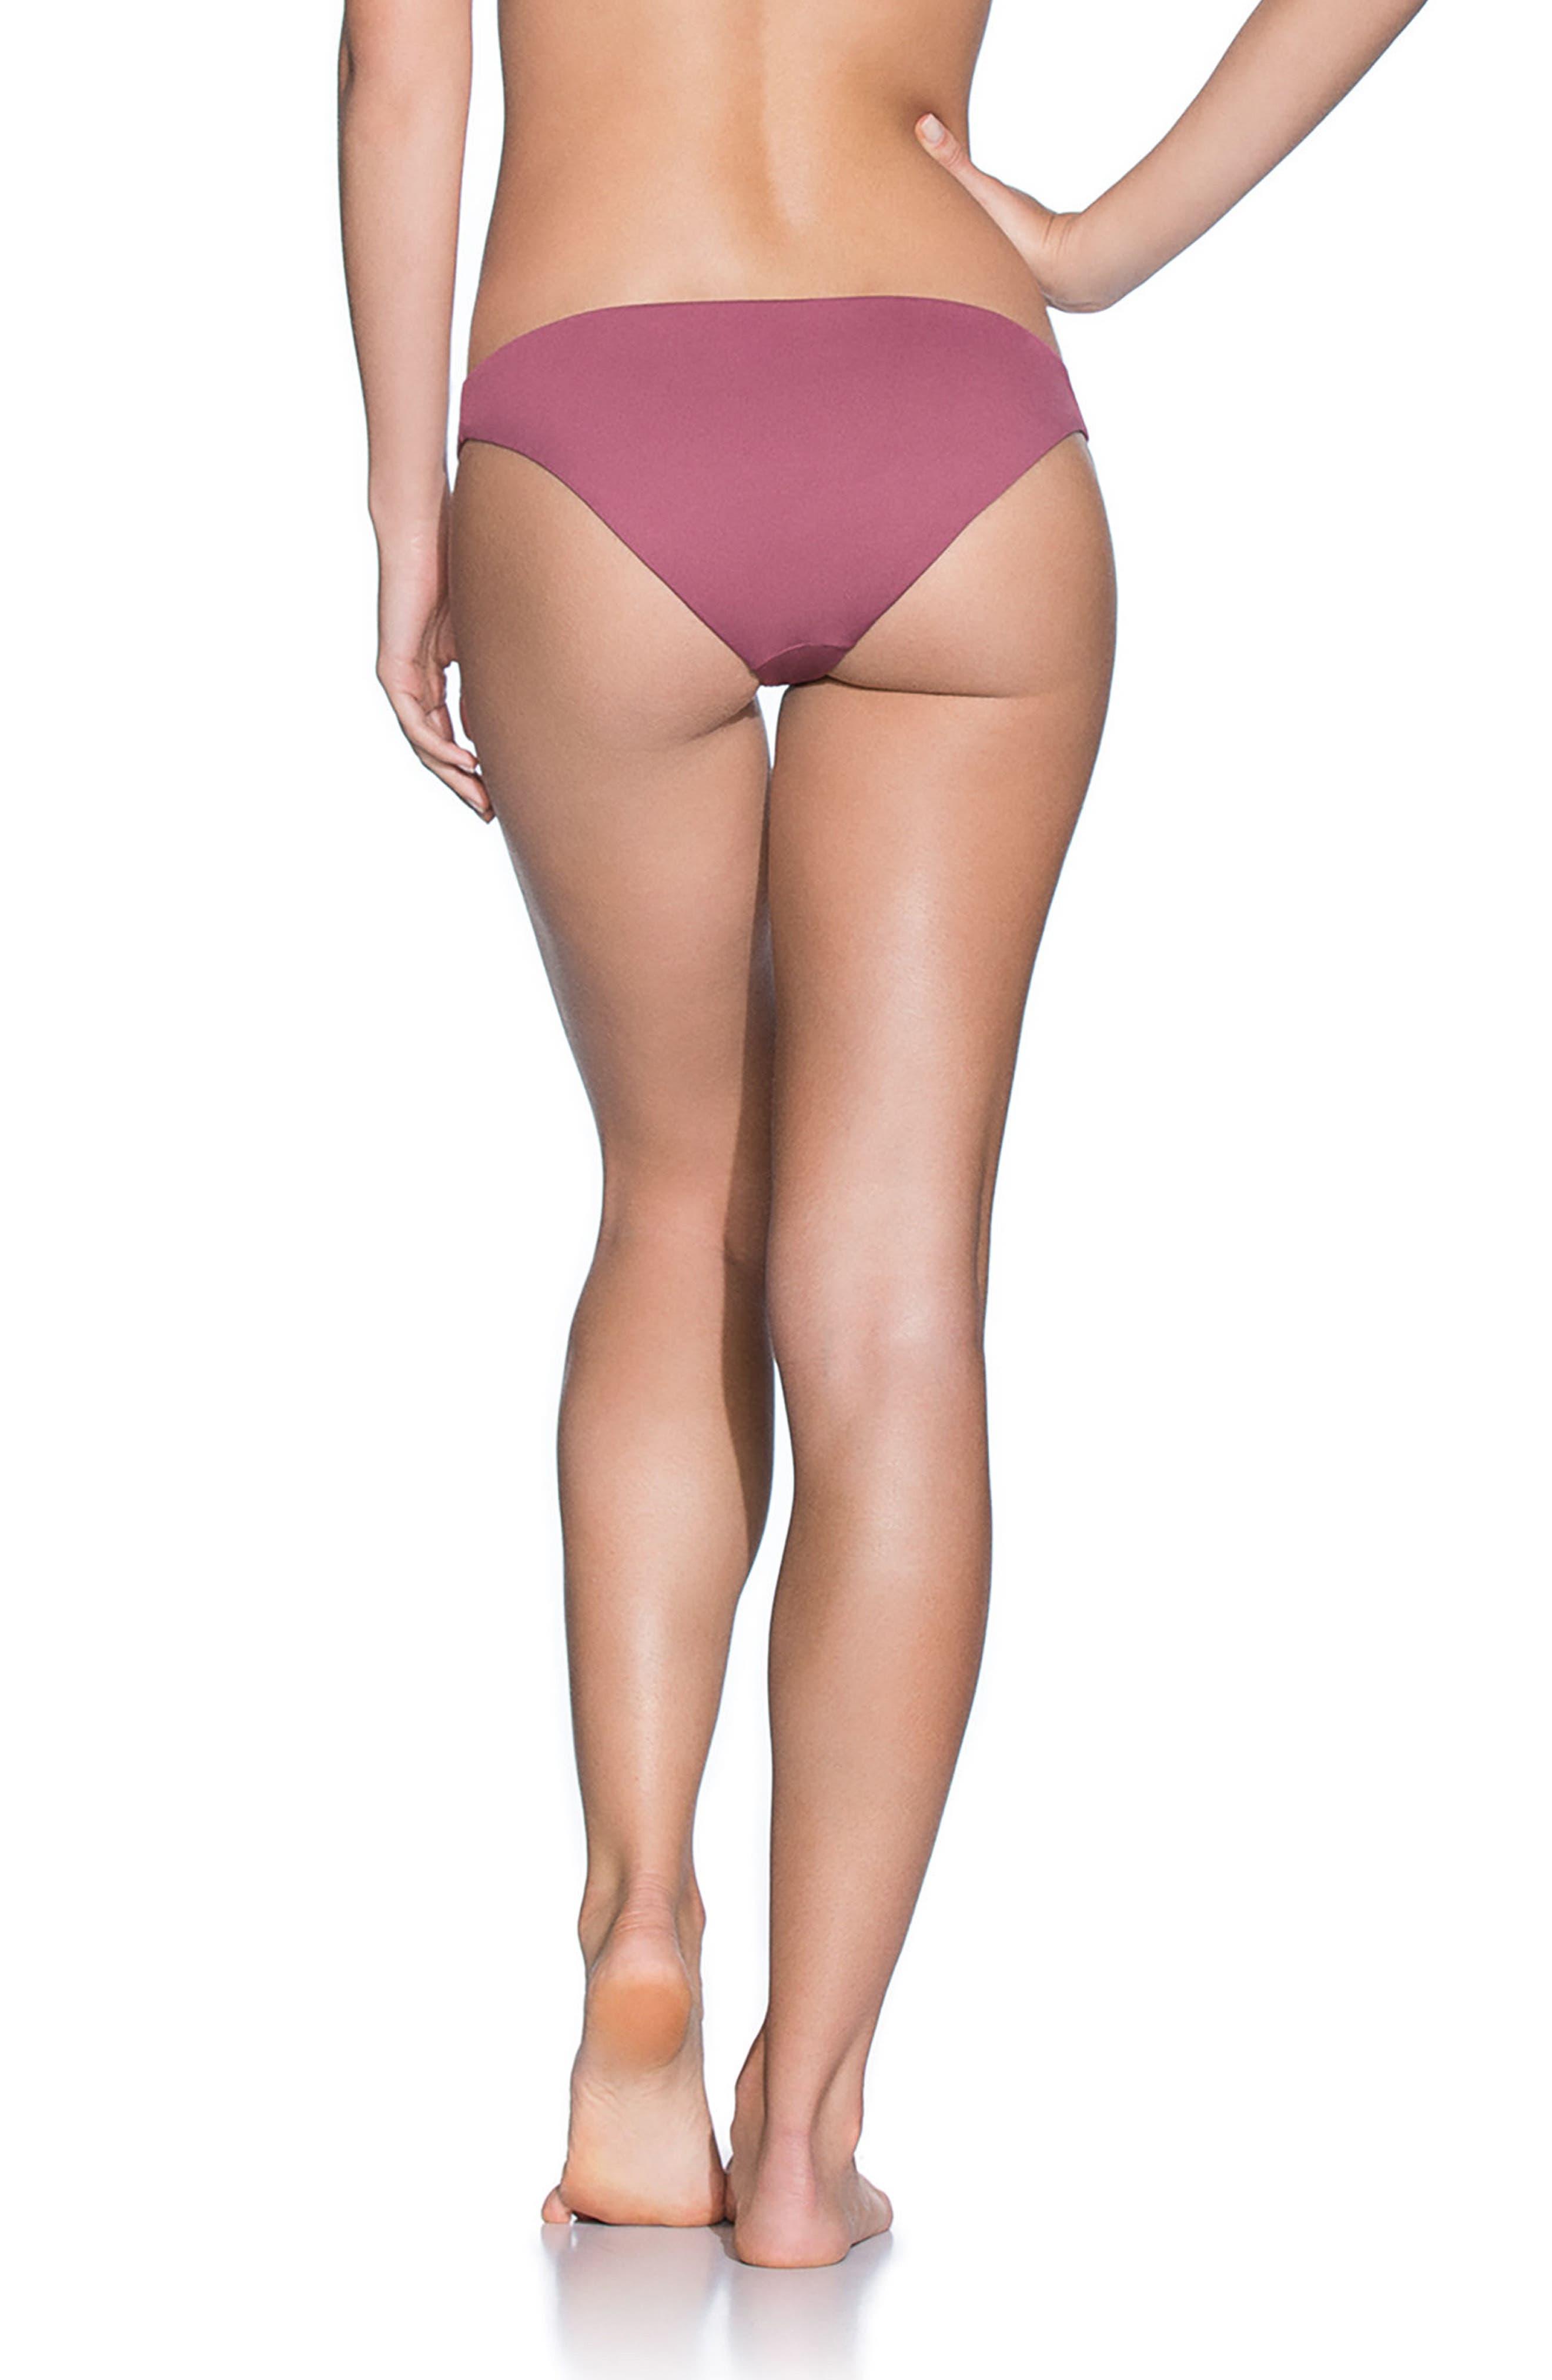 Juneberry Flirt Reversible Bikini Bottoms,                             Alternate thumbnail 2, color,                             Juneberry